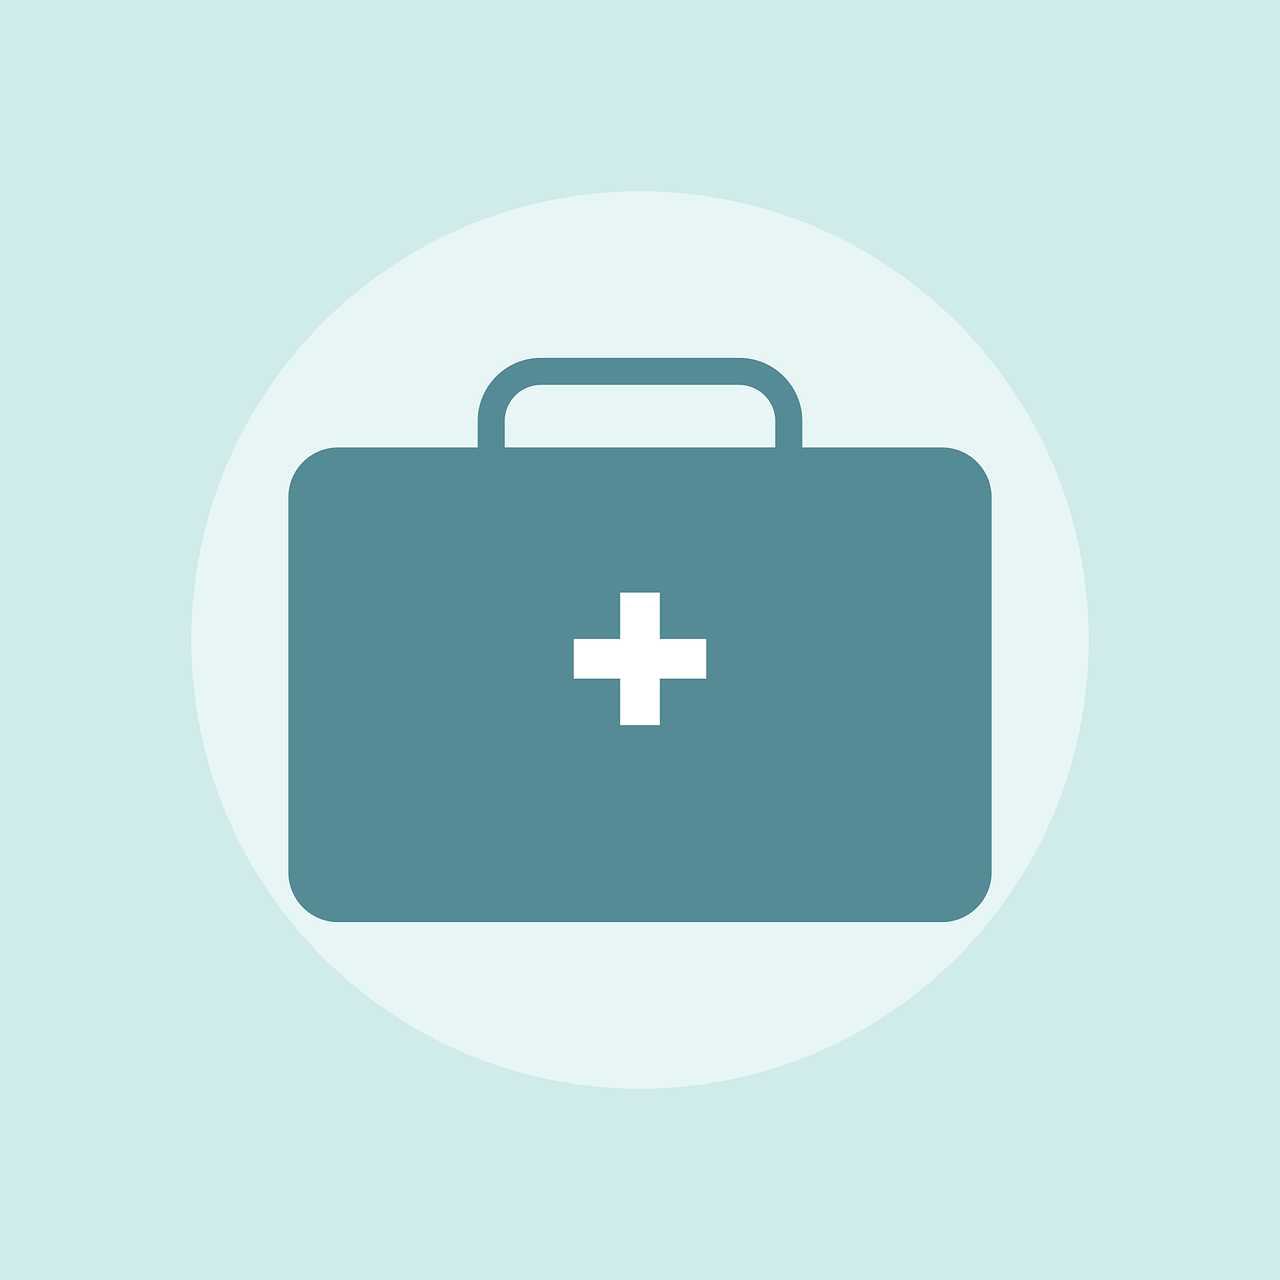 medical-bag-1674902_1280.png